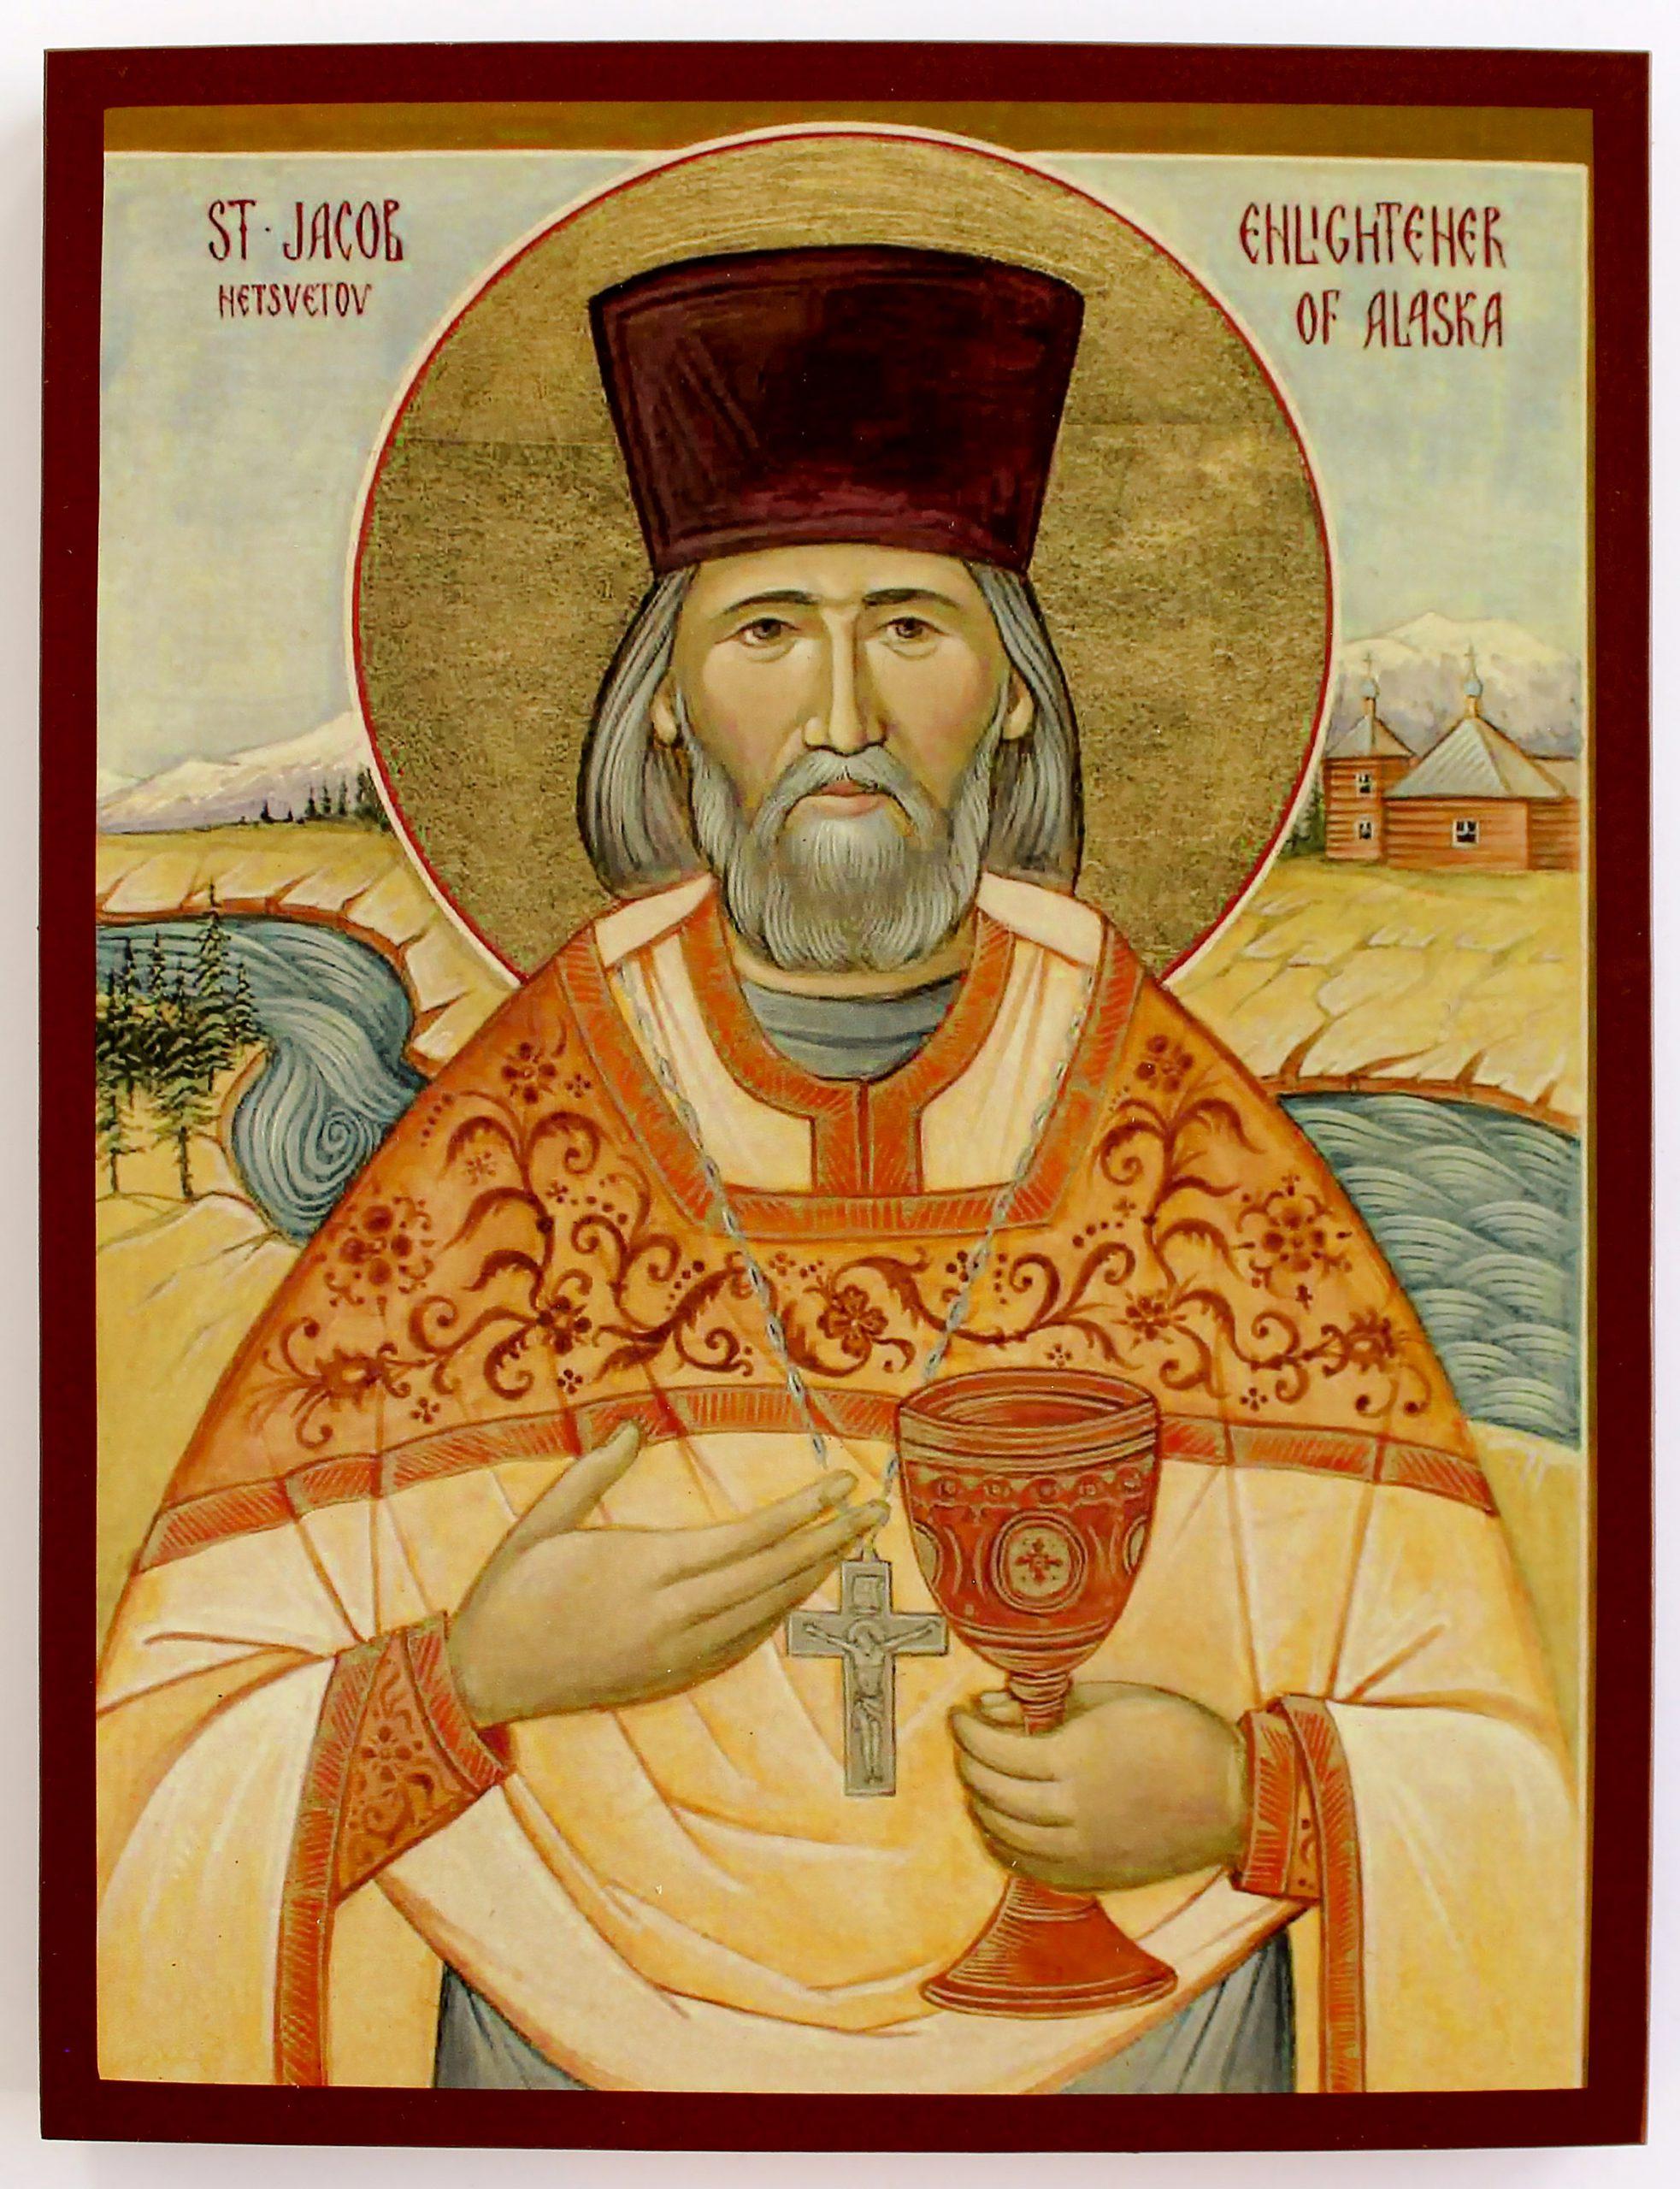 St. Jacob Netsvetov